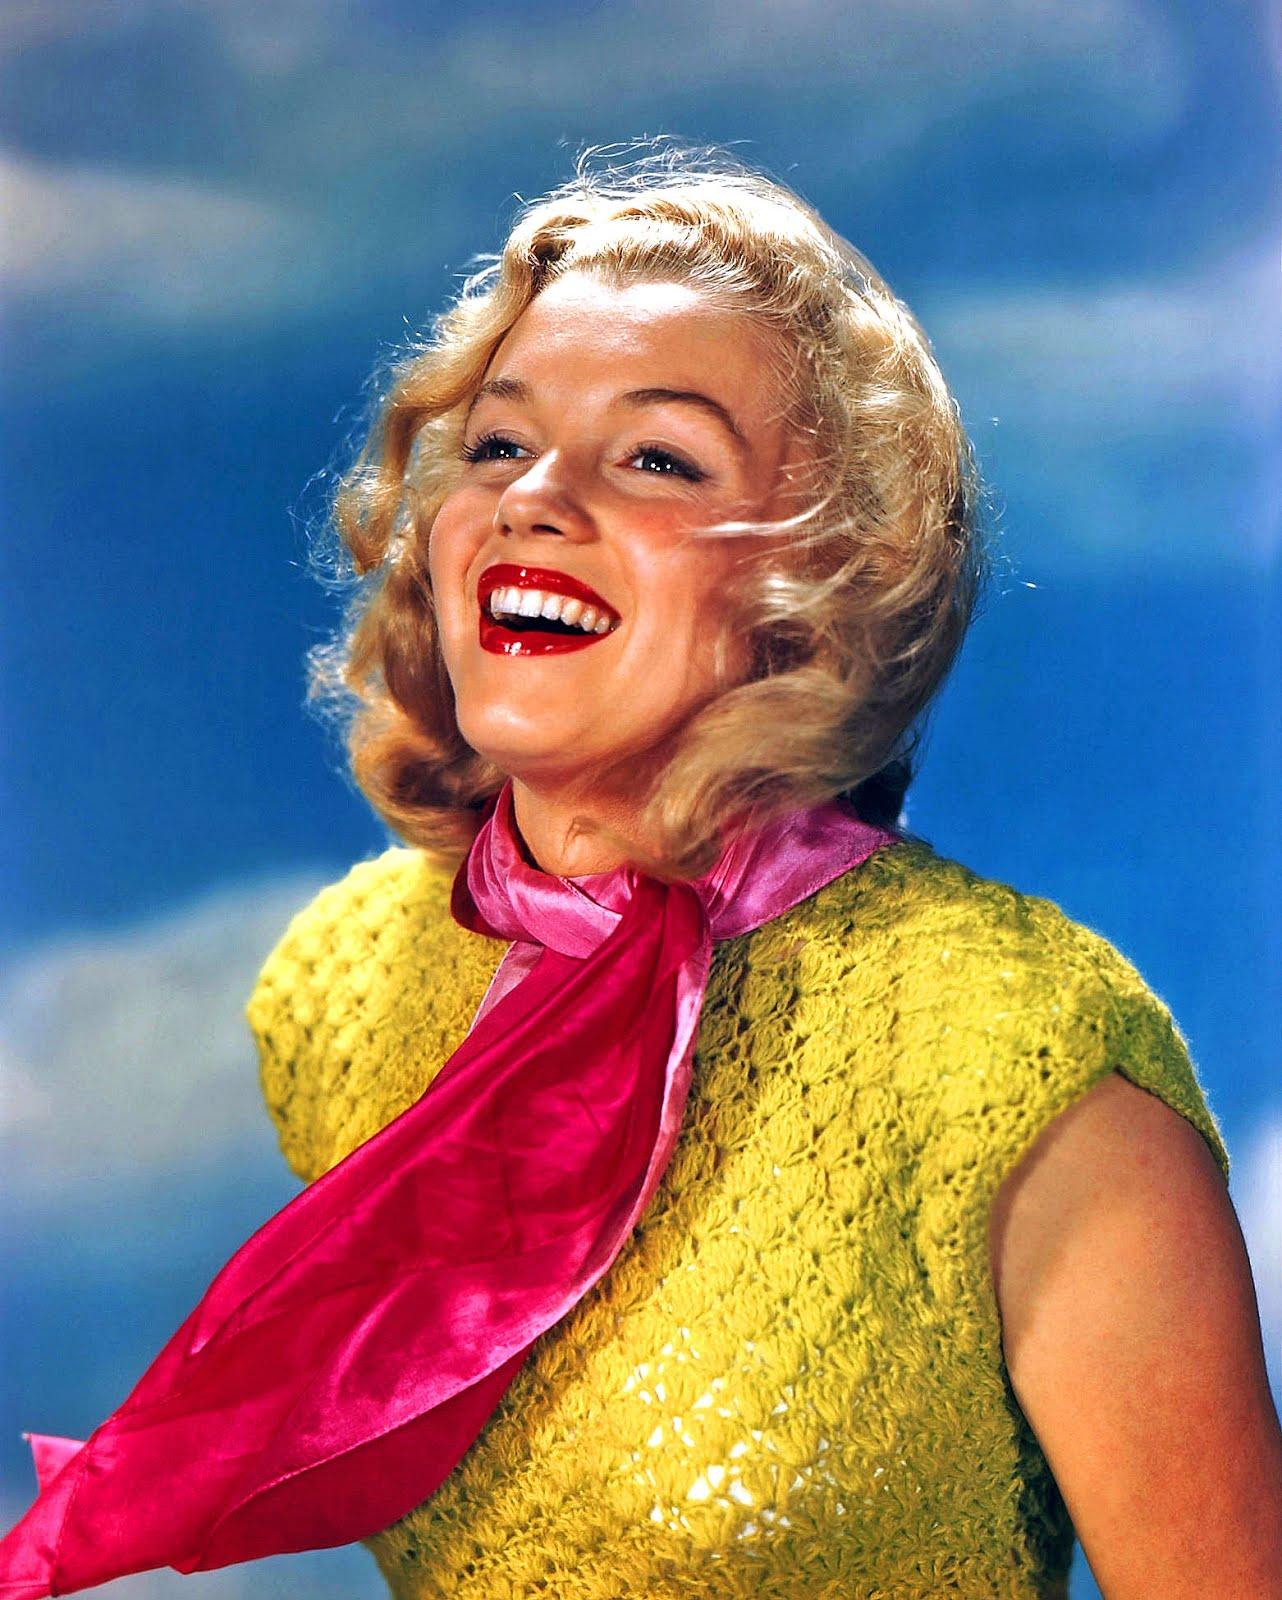 http://1.bp.blogspot.com/-PZE26EXqbfo/UOLvipwKtpI/AAAAAAAAUes/giFJAzrVP6M/s1600/Young-Marilyn-Monroe-Beautiful.jpg